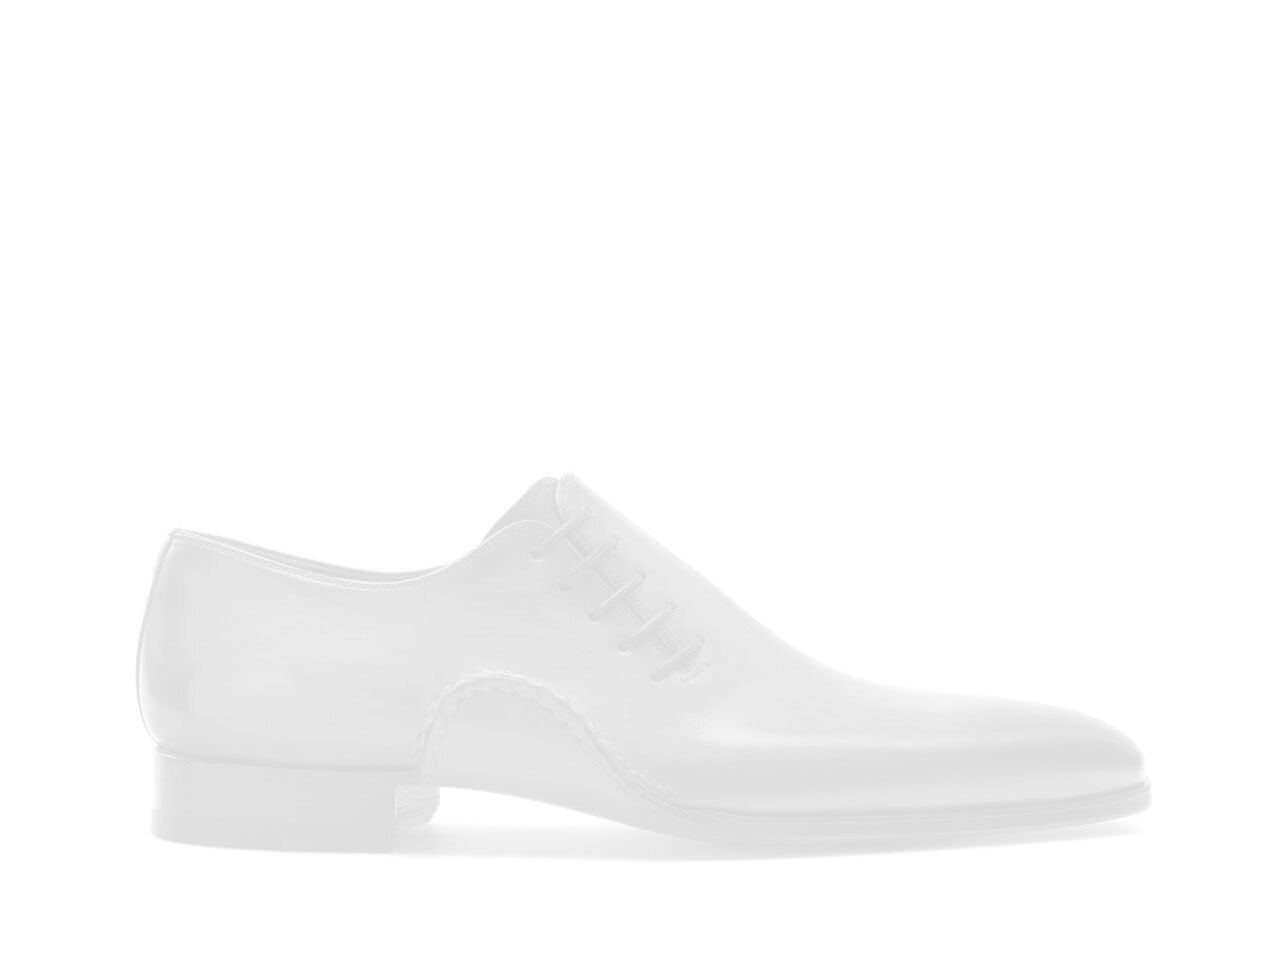 Pair of the Magnanni Reina Cognac Men's Sneakers